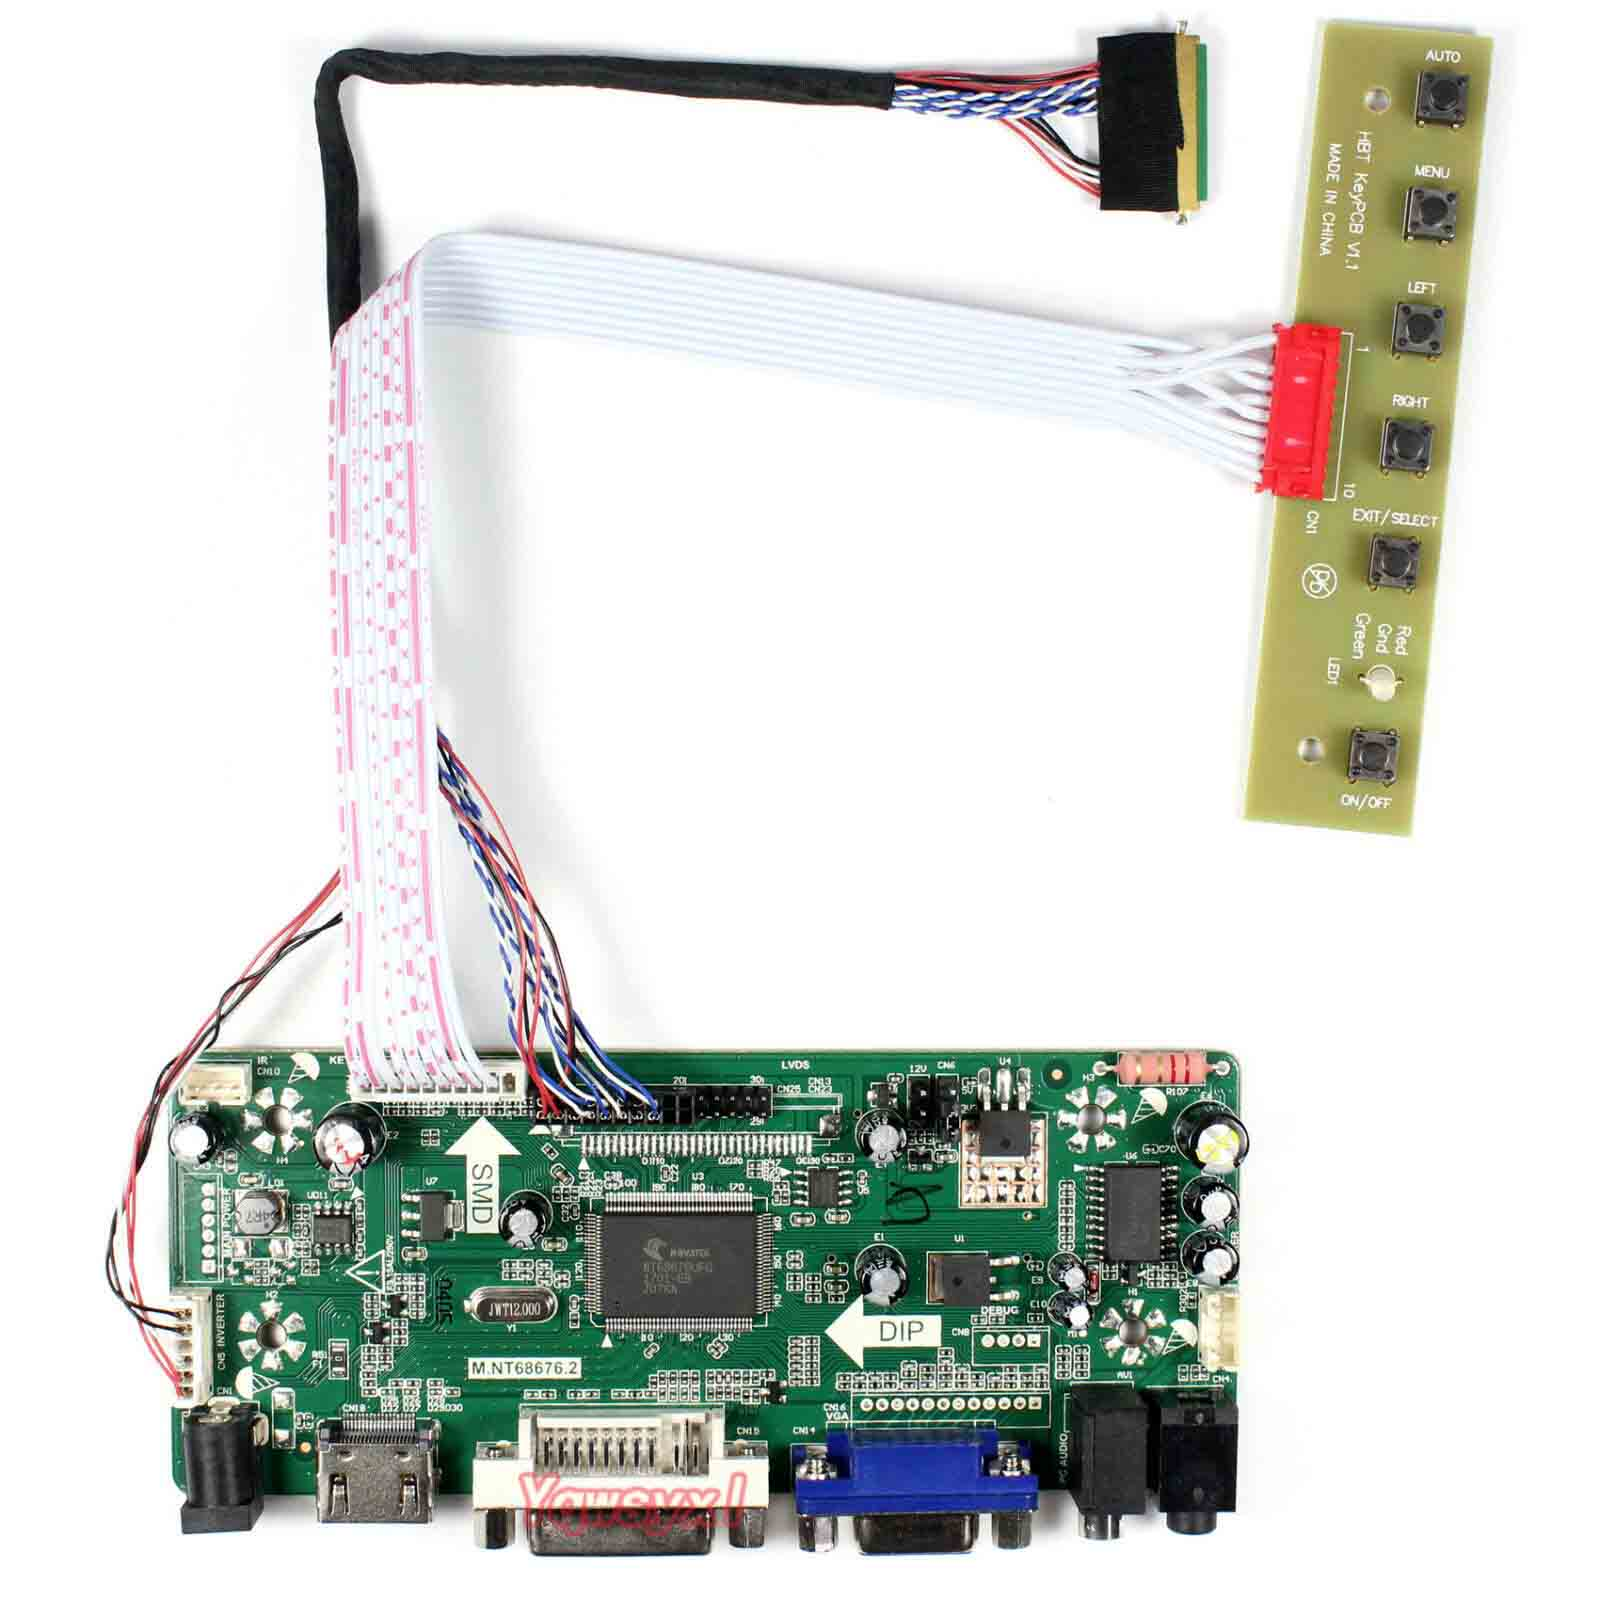 Yqwsyxl плата управления монитор комплект для B140XW01 V1 B140XW01 V3 HDMI + DVI + VGA ЖК-светодиодный экран управления Лер плата драйвер